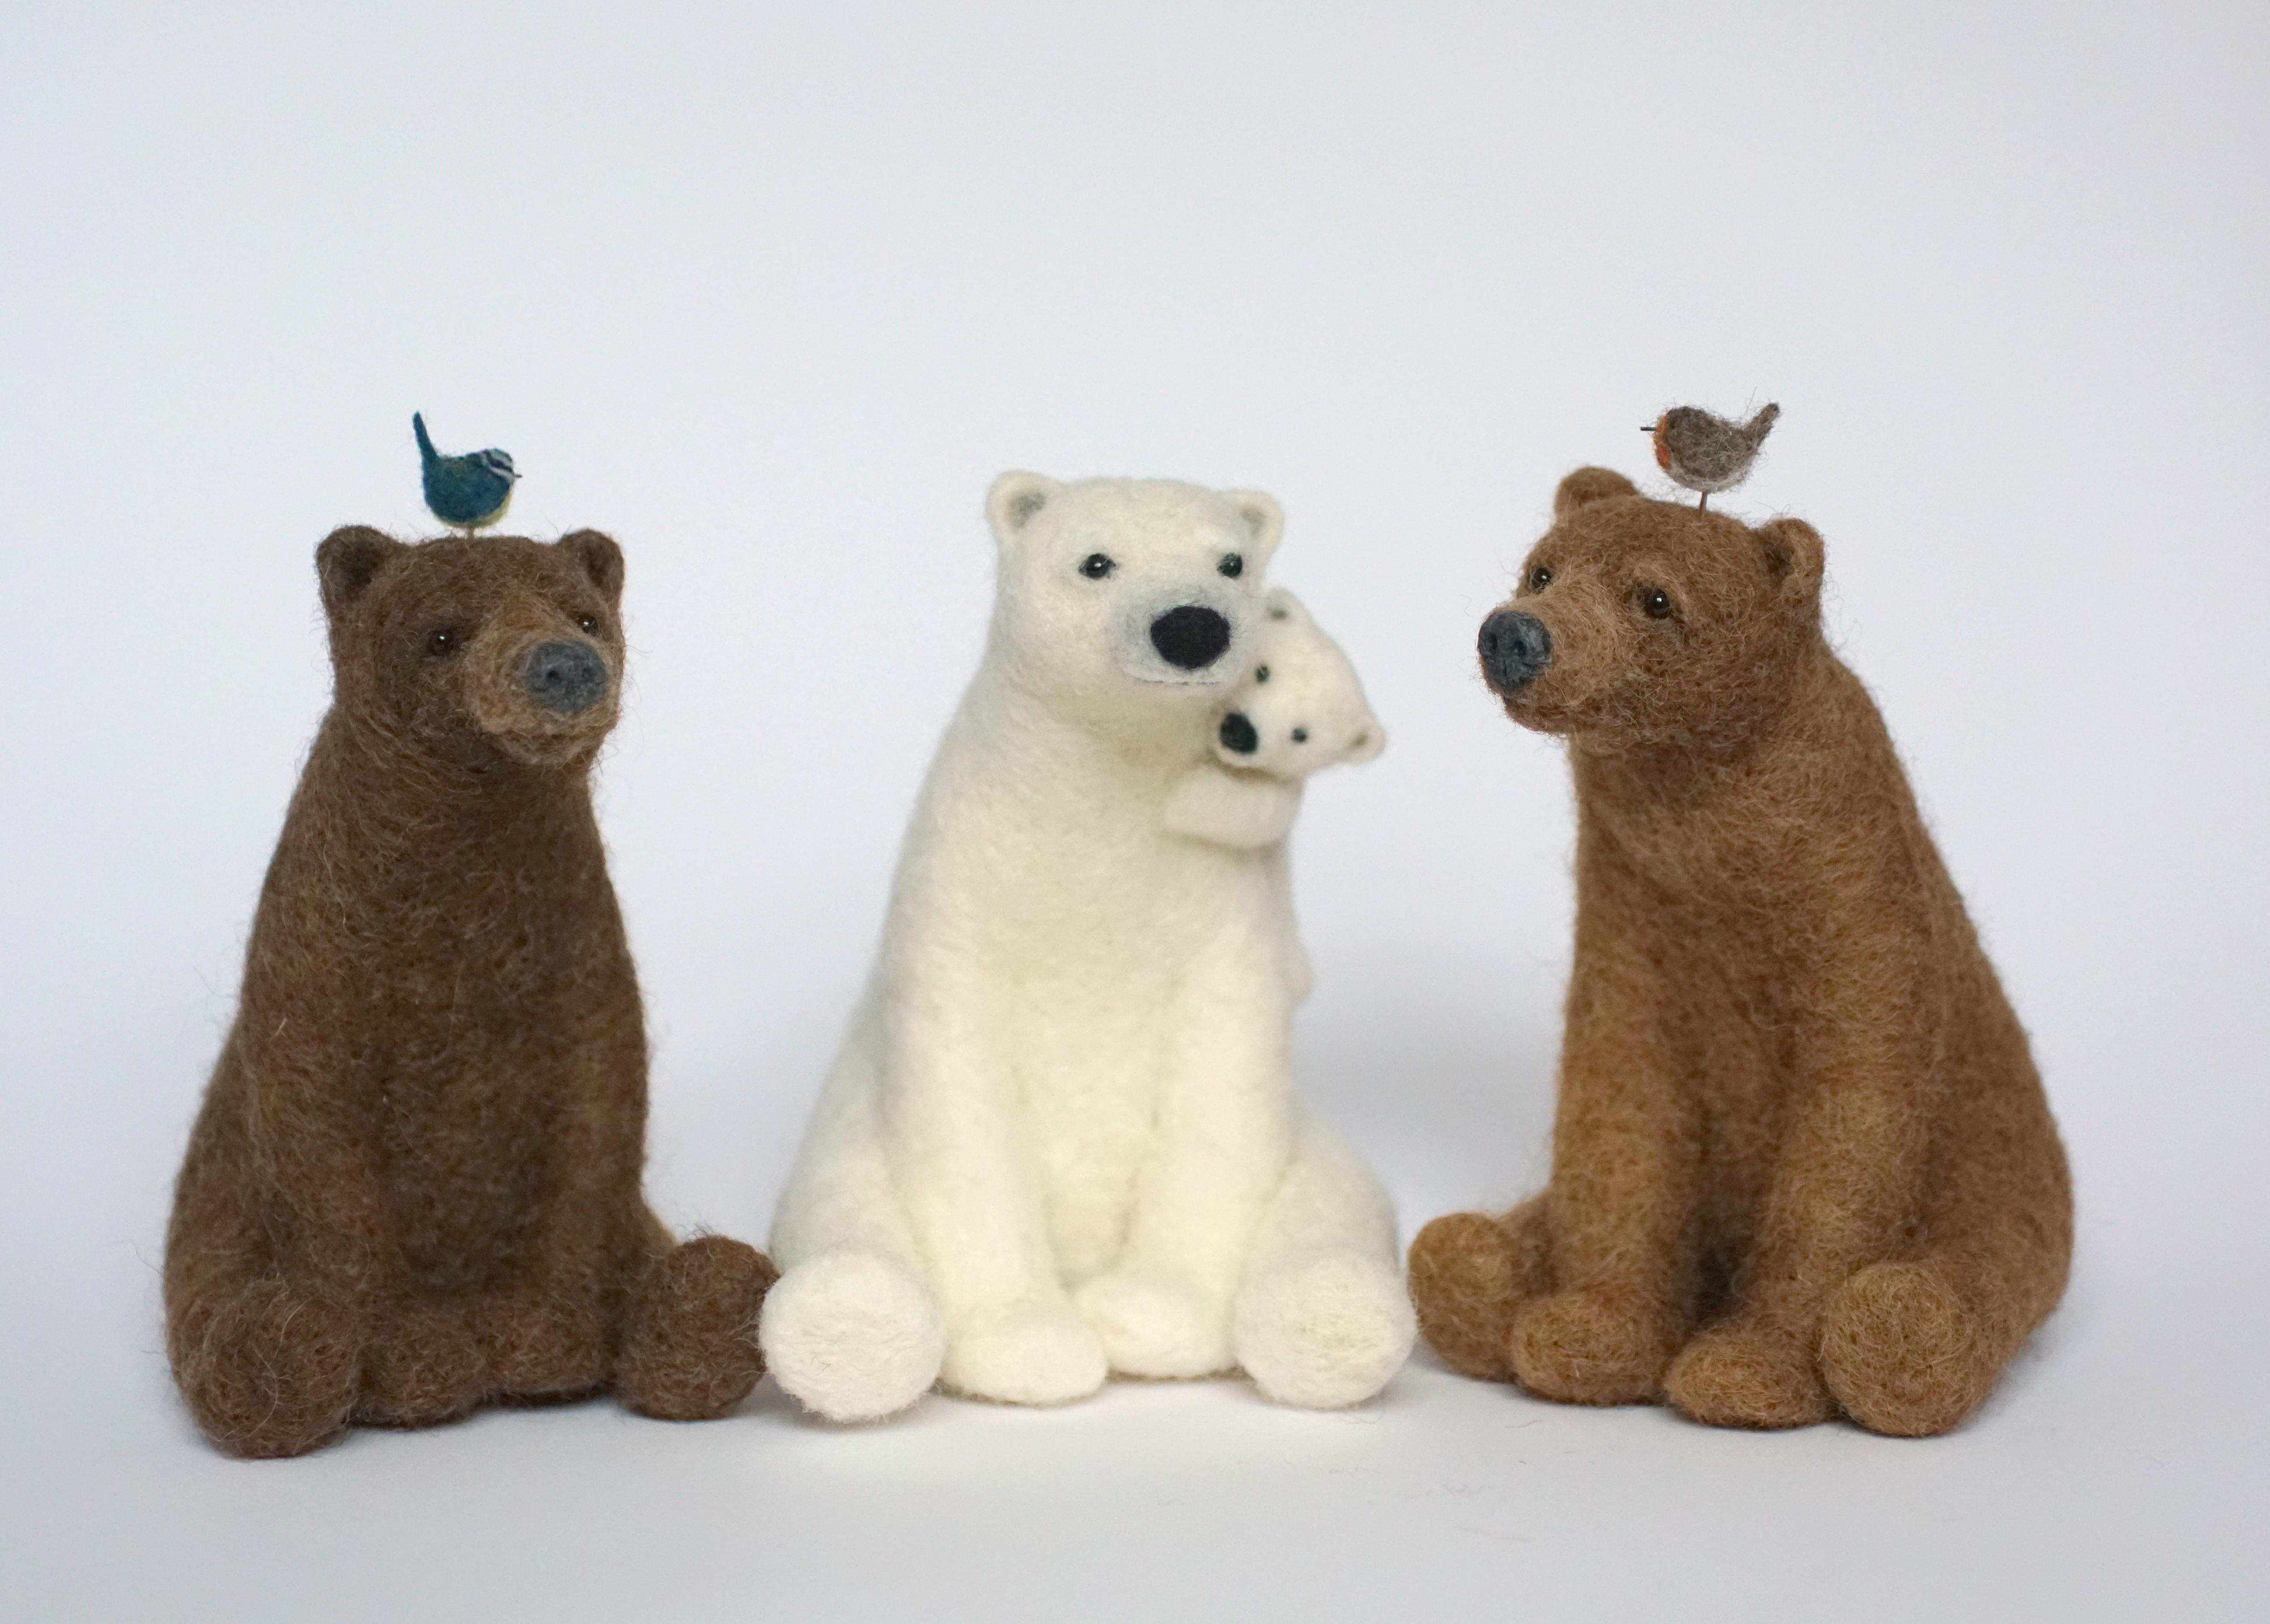 3 bears Jo Gardiner Art